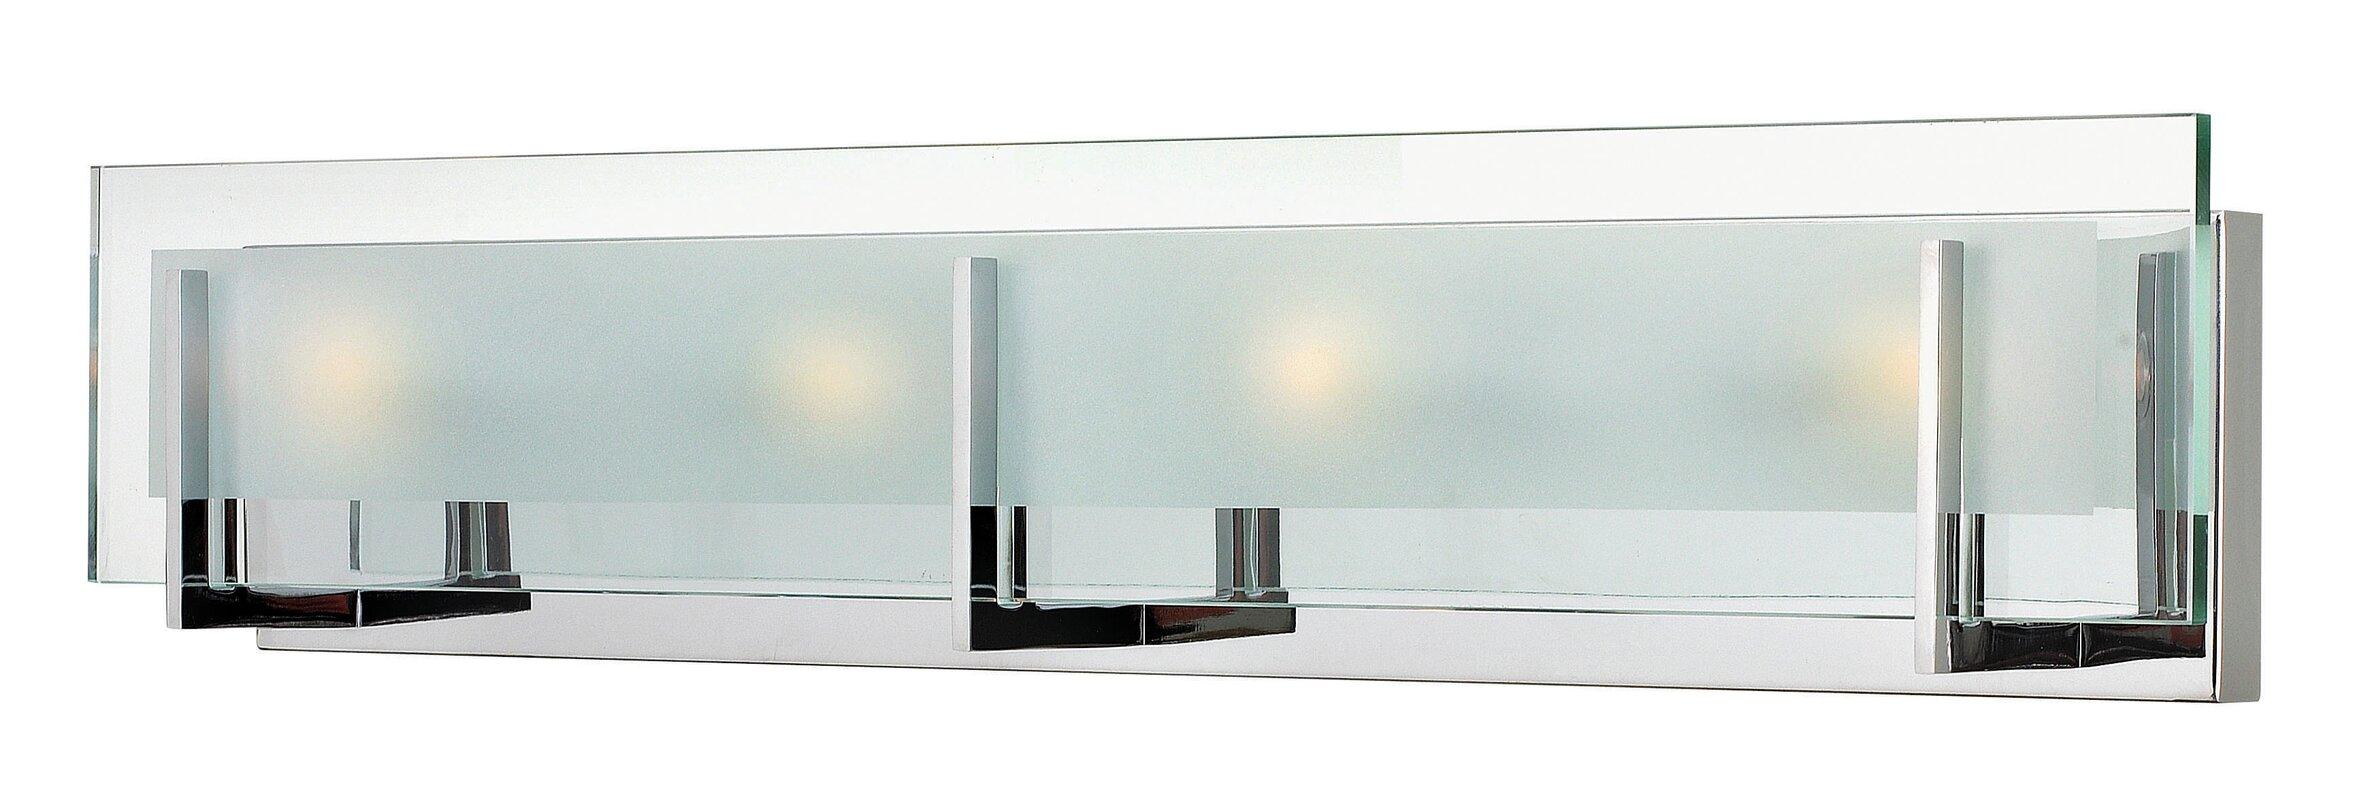 Frances 4 light bath bar reviews allmodern frances 4 light bath bar aloadofball Images